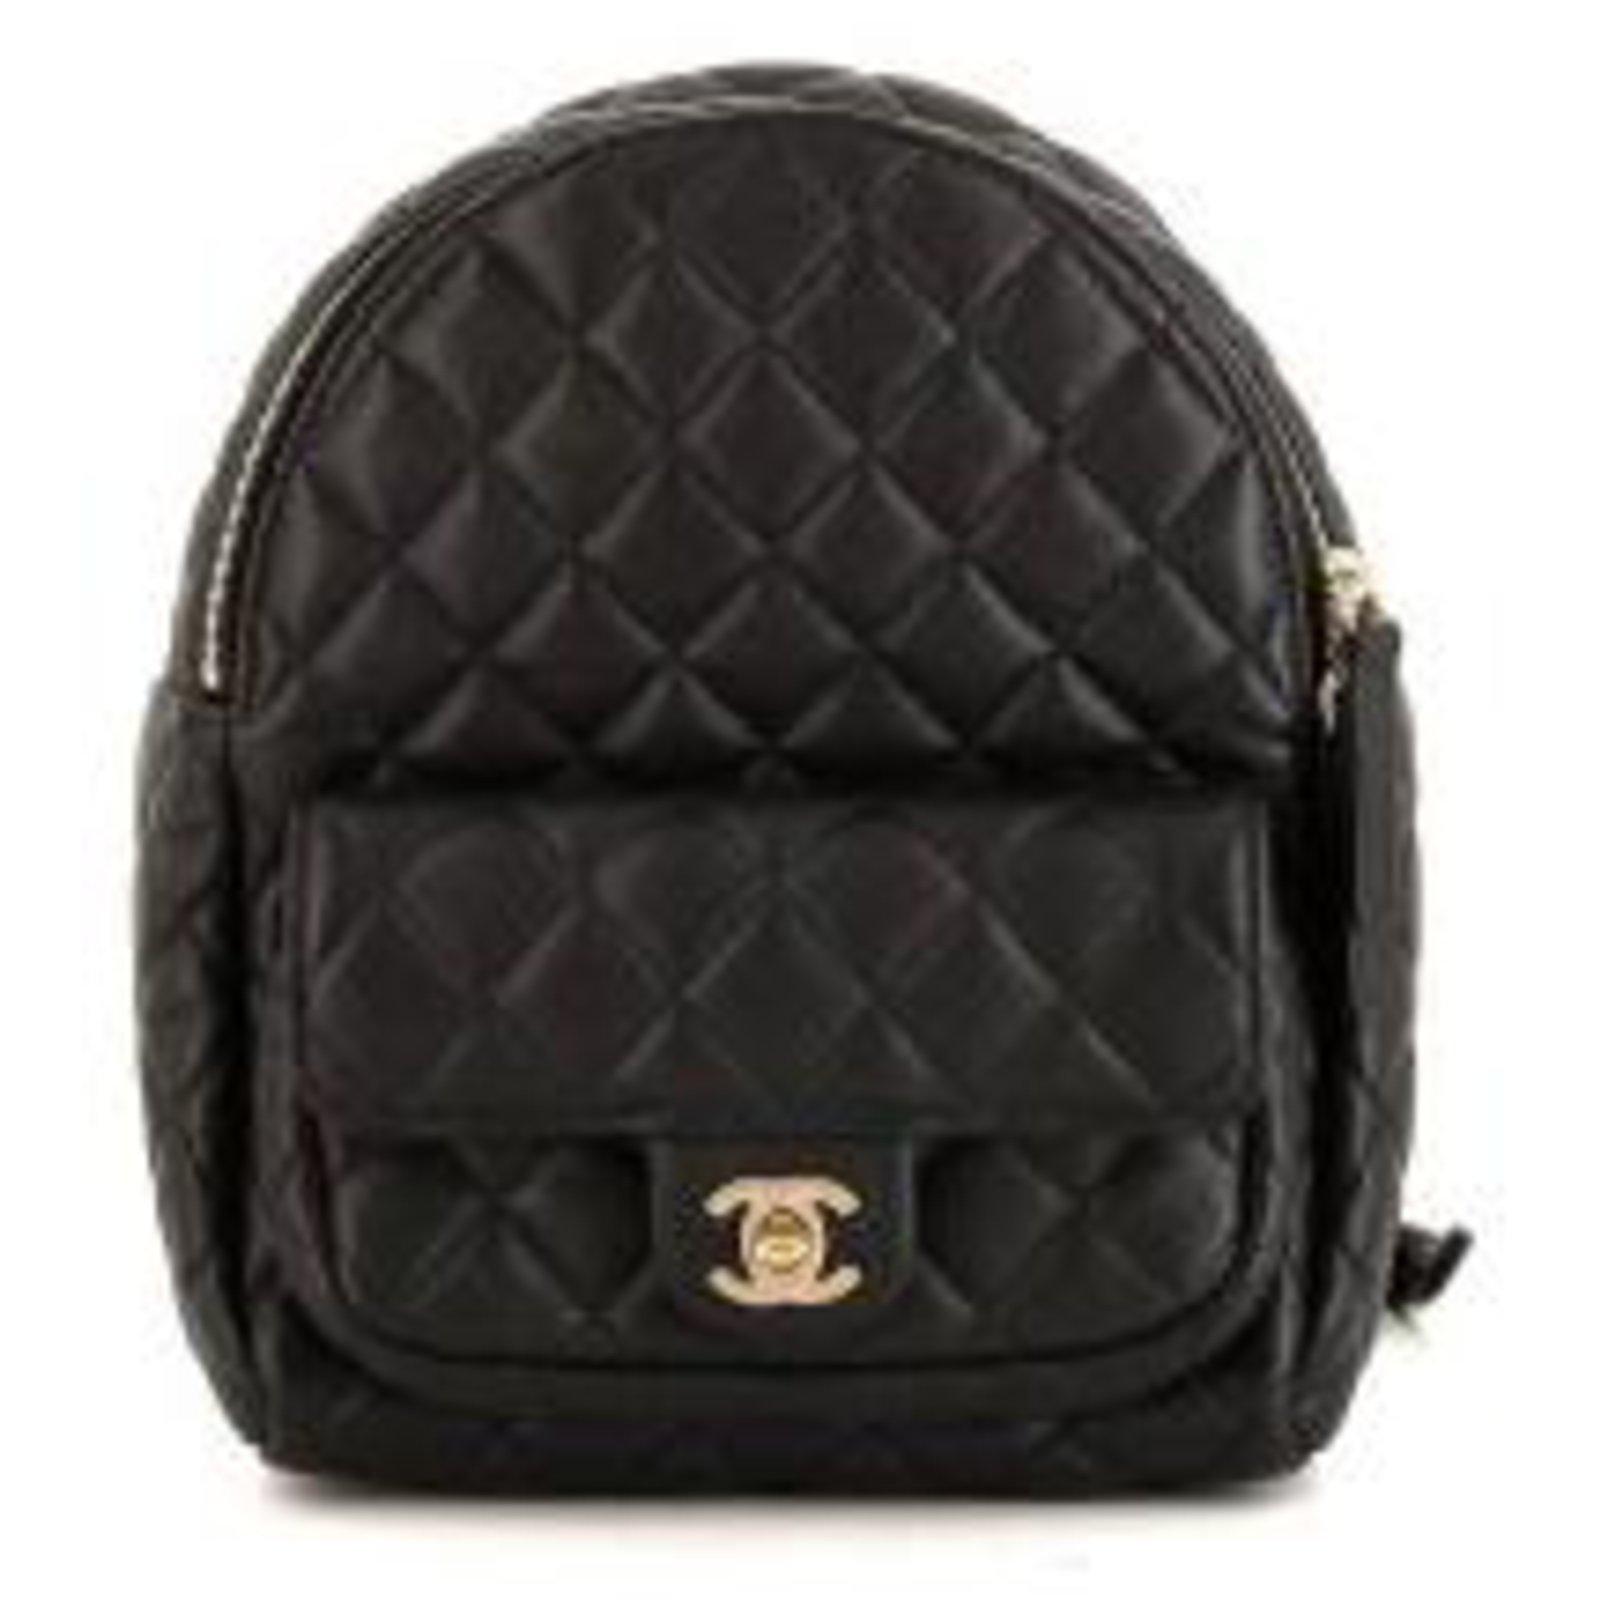 Chanel Chanel Leather Backpack Backpacks Leather Black ref.112626 ... 06aff8ca78cd3